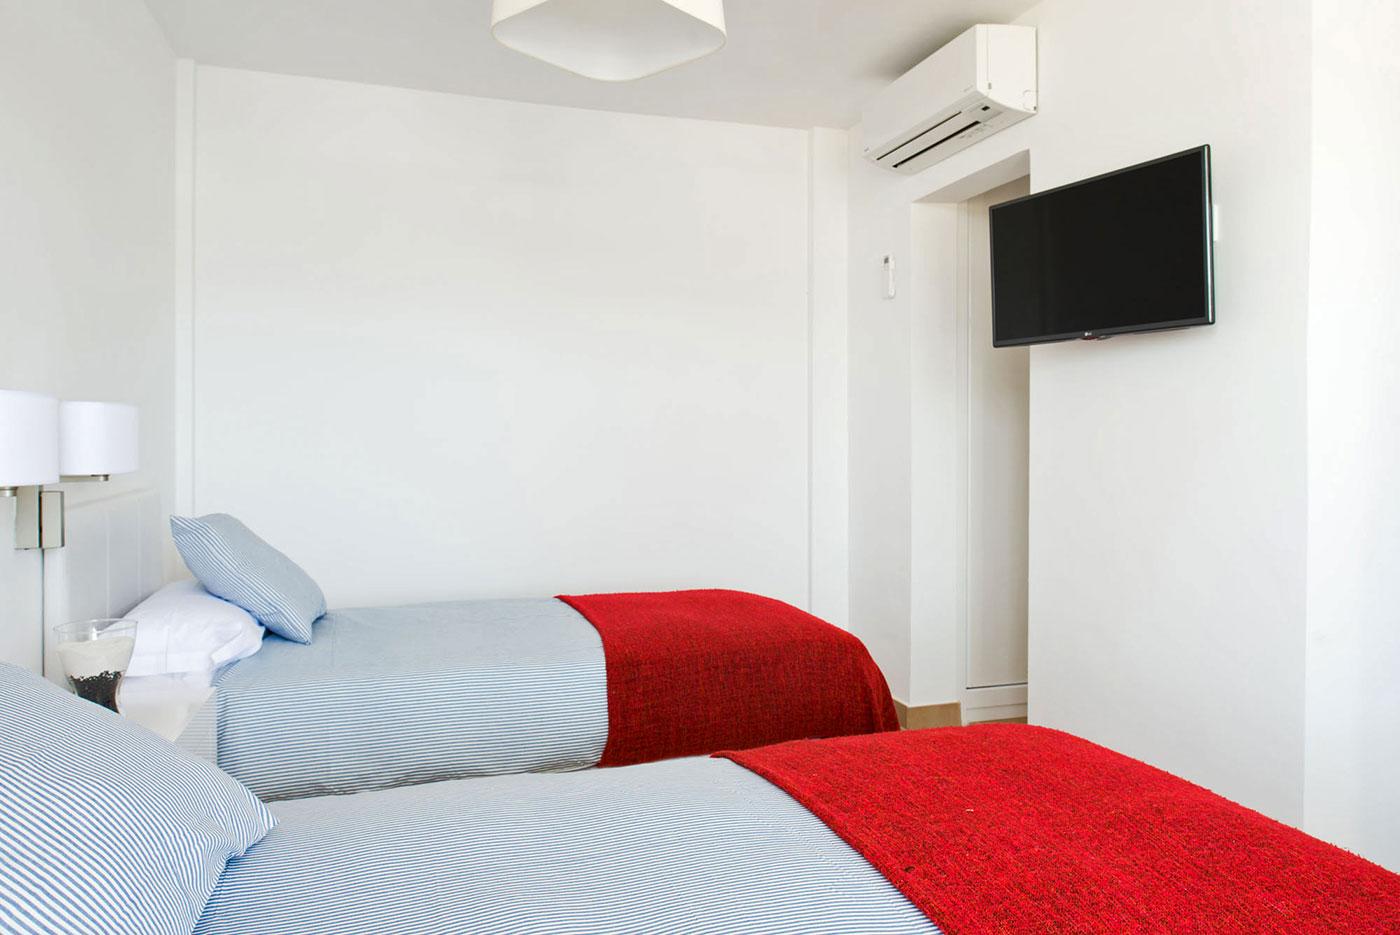 villas_de_la_marina_twin-beds_1400px